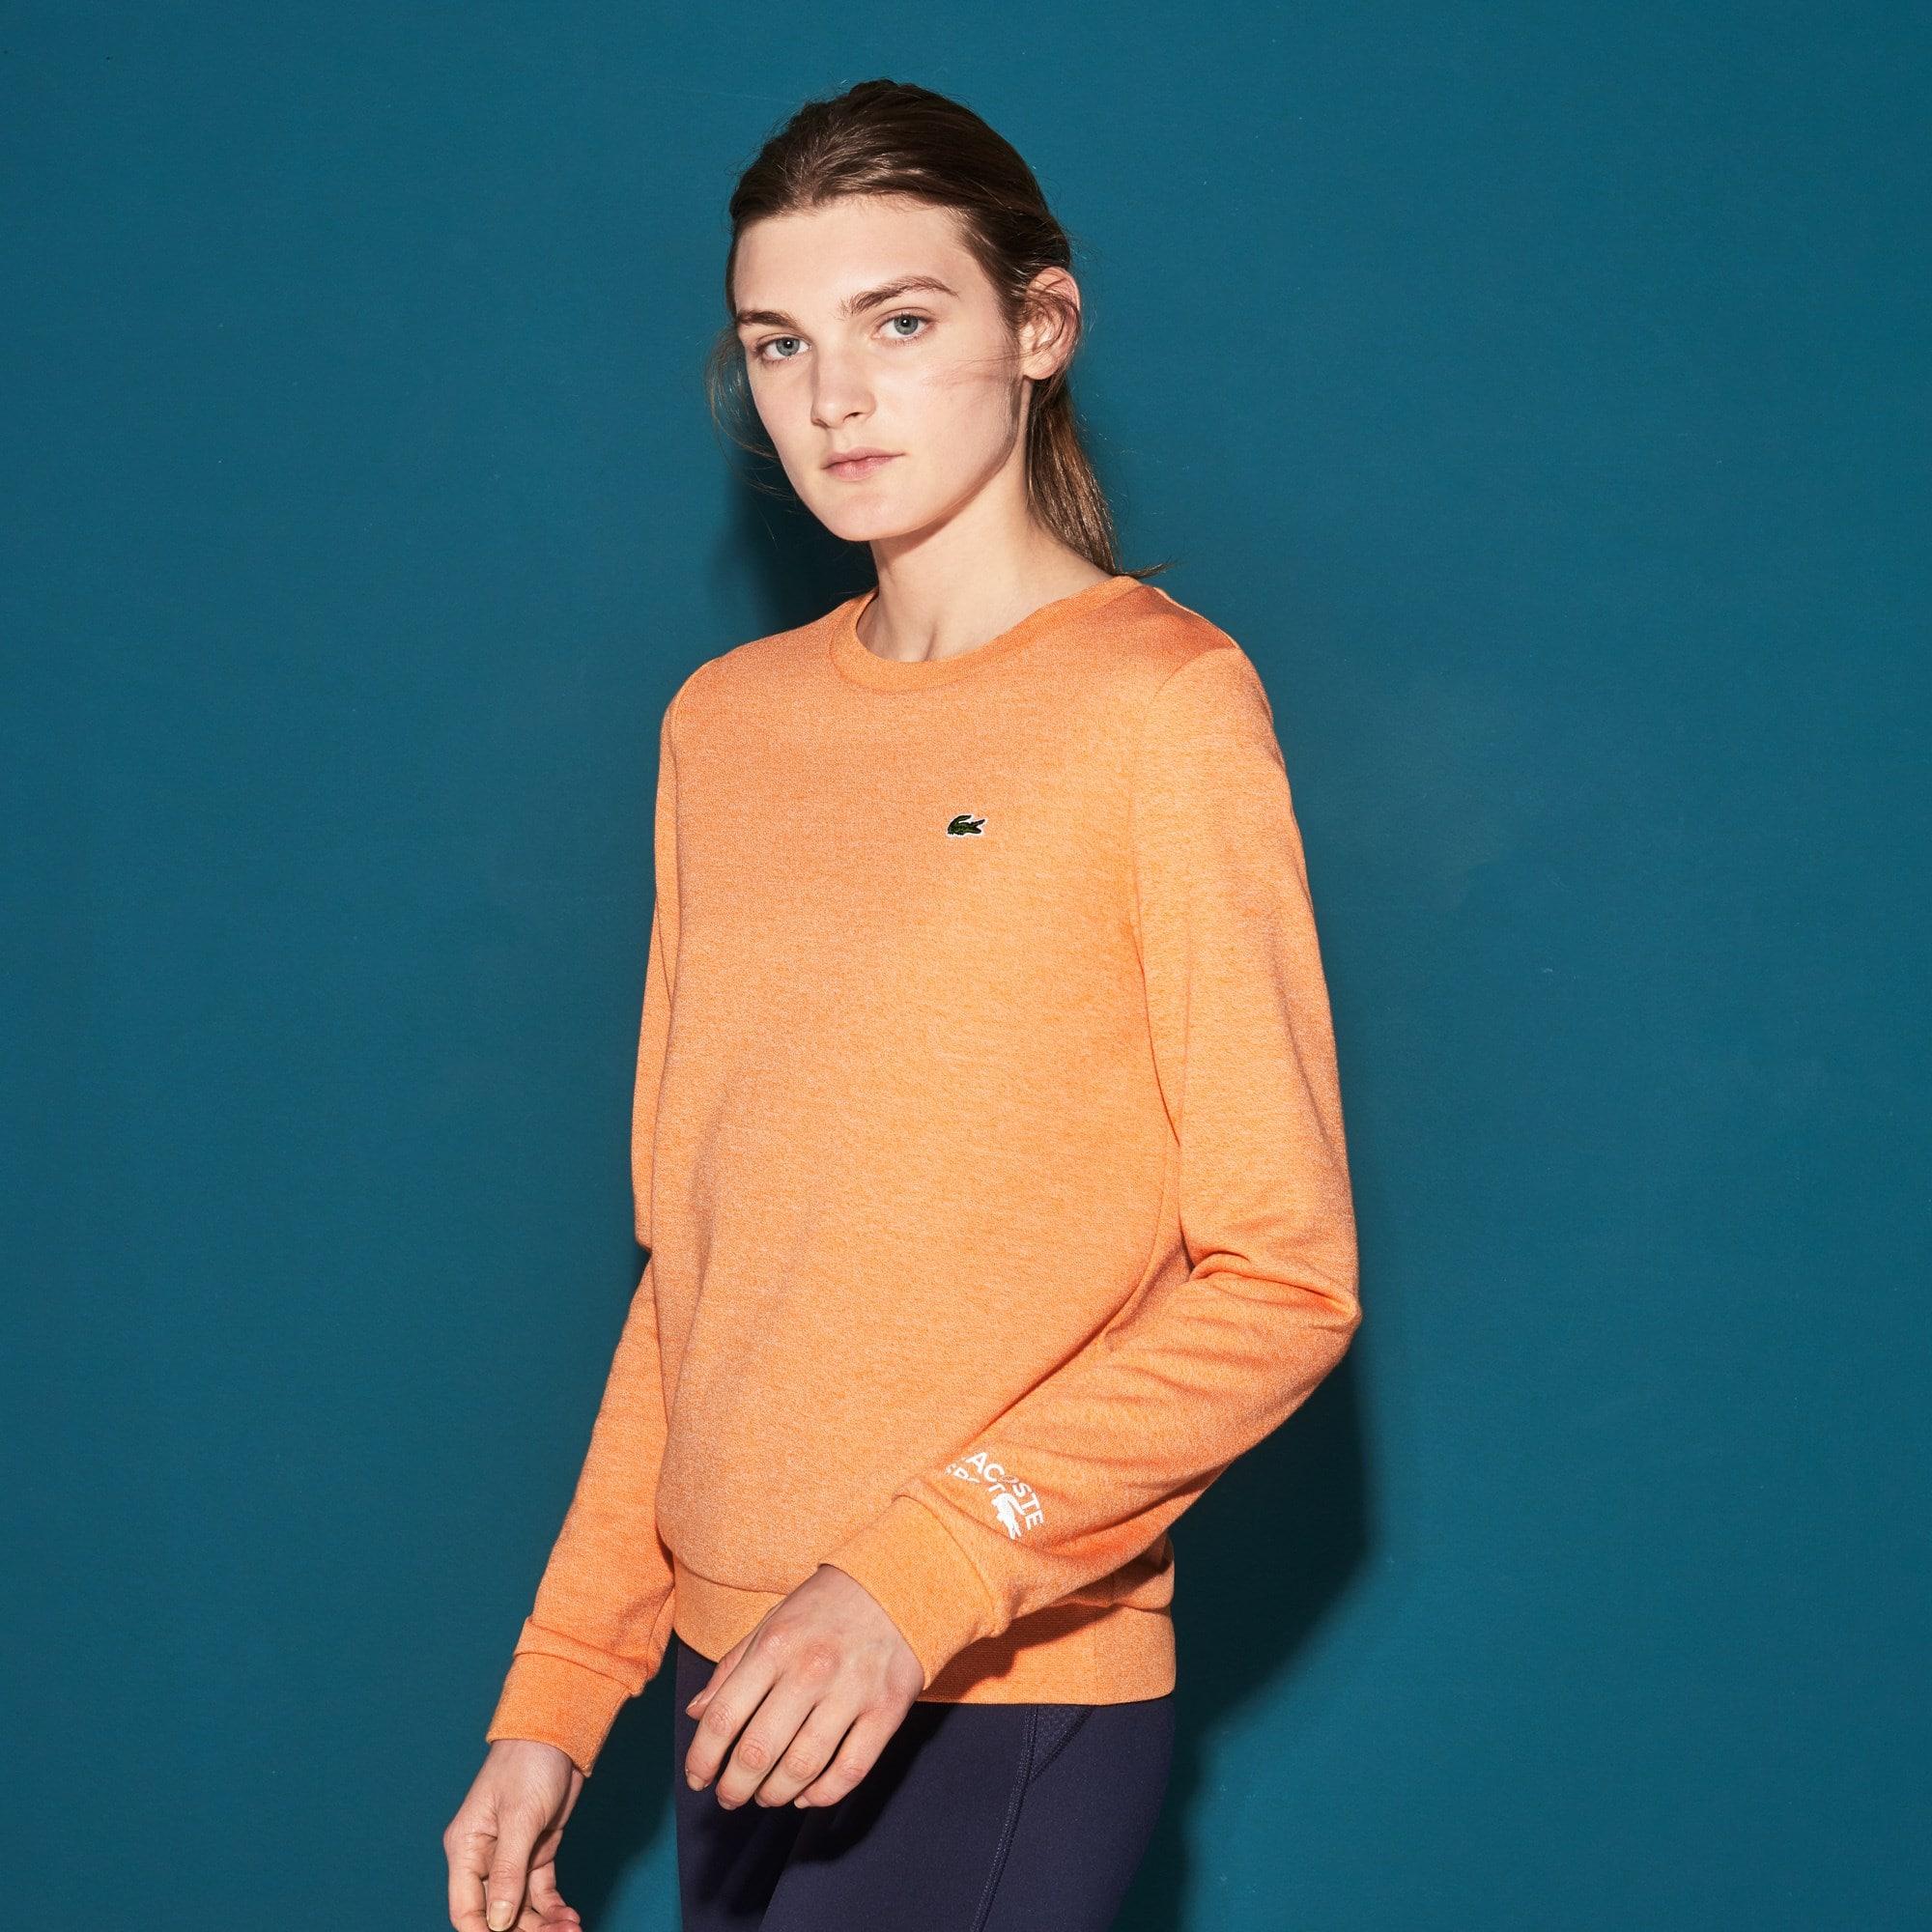 Jungen-Rundhals-Sweatshirt aus Fleece LACOSTE SPORT TENNIS